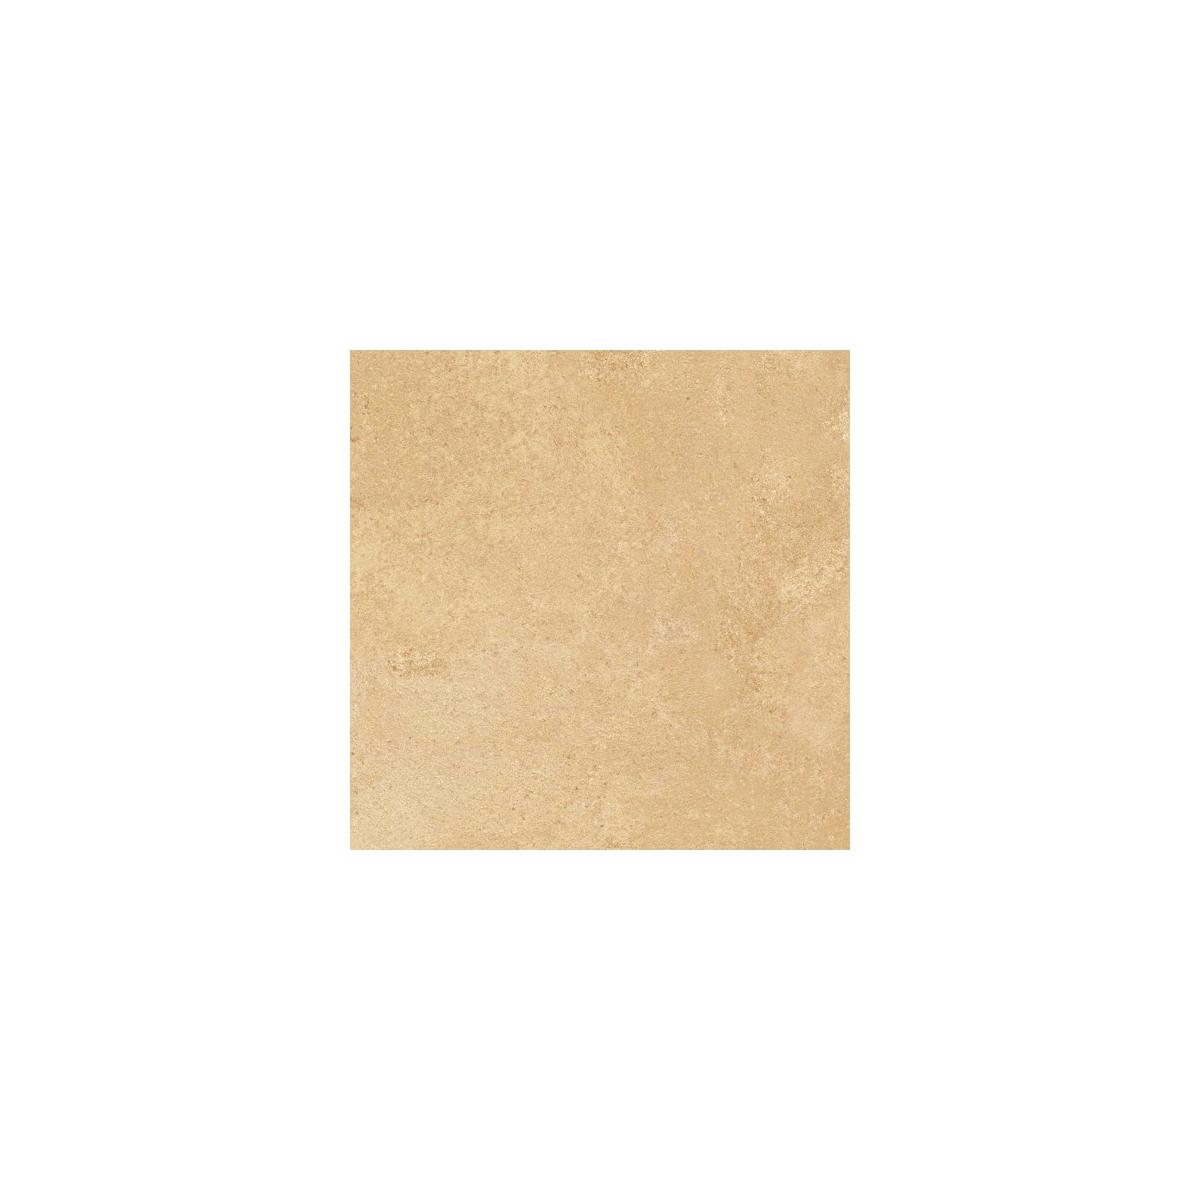 Alarcón Paja (caja) - Colección Alarcón de Vives - Marca Vives